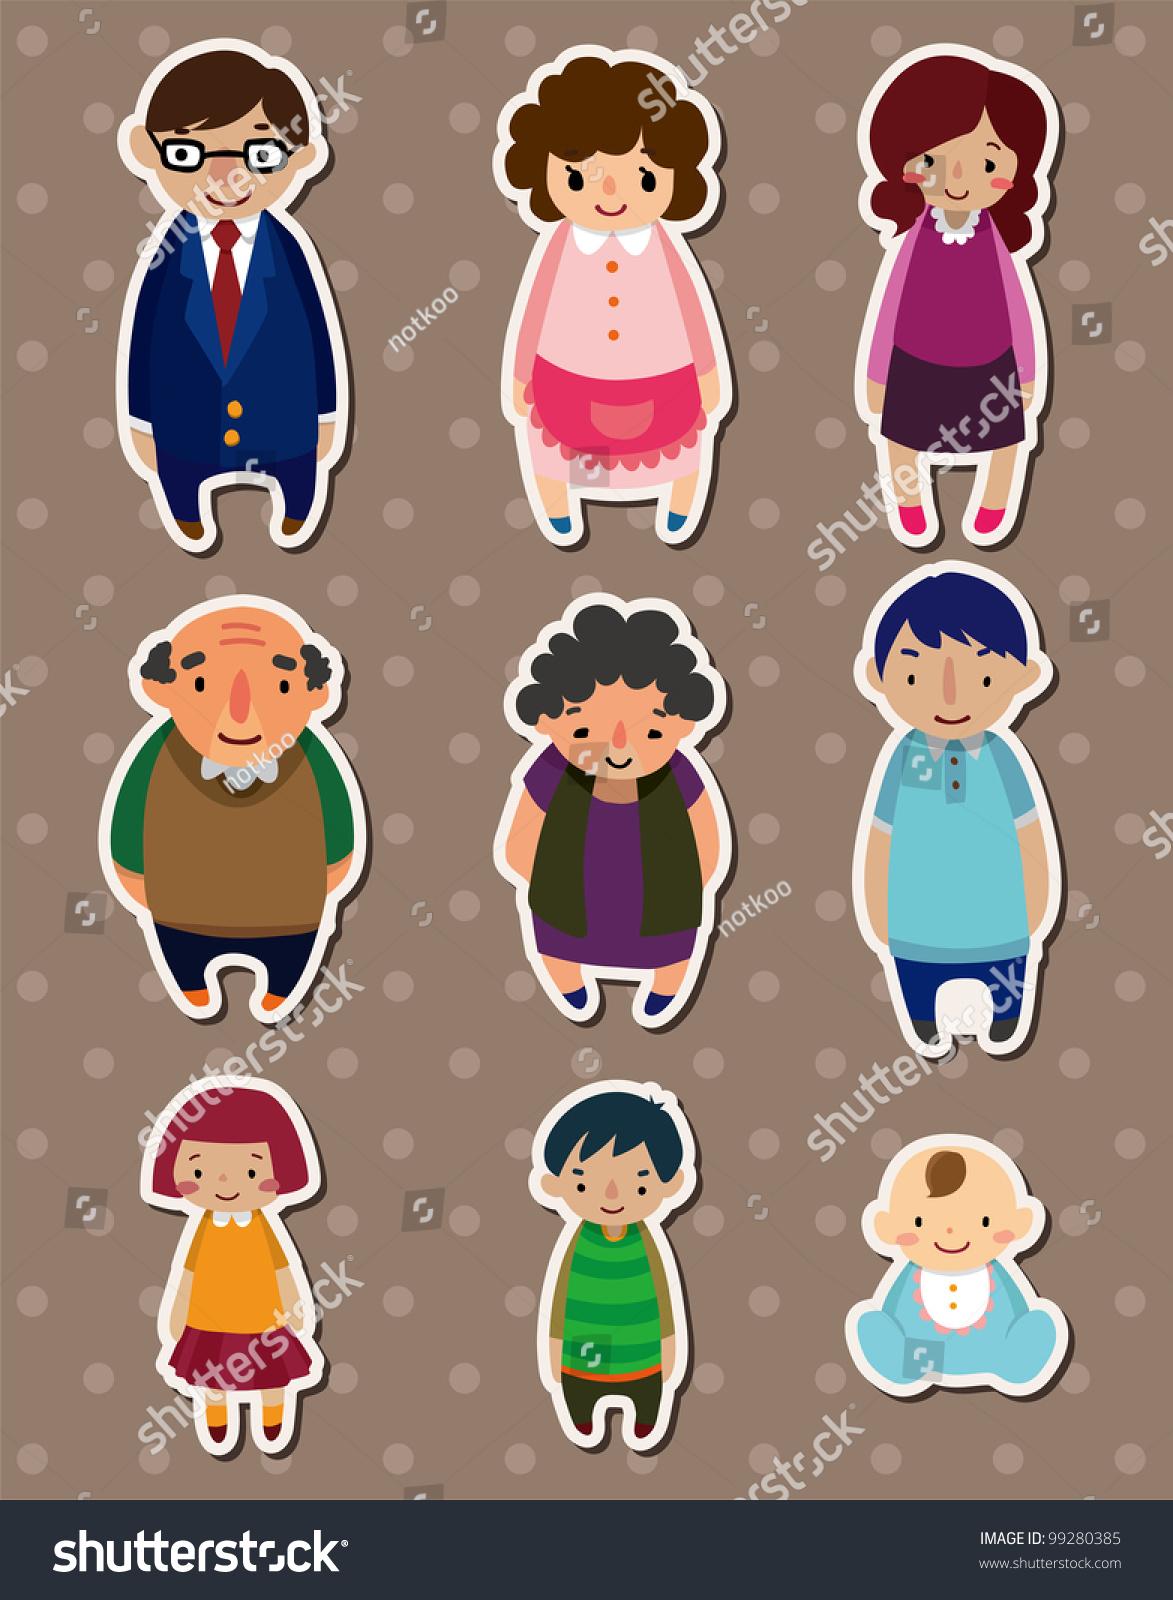 Cartoon Family Stickers,Label Stock Vector Illustration ...